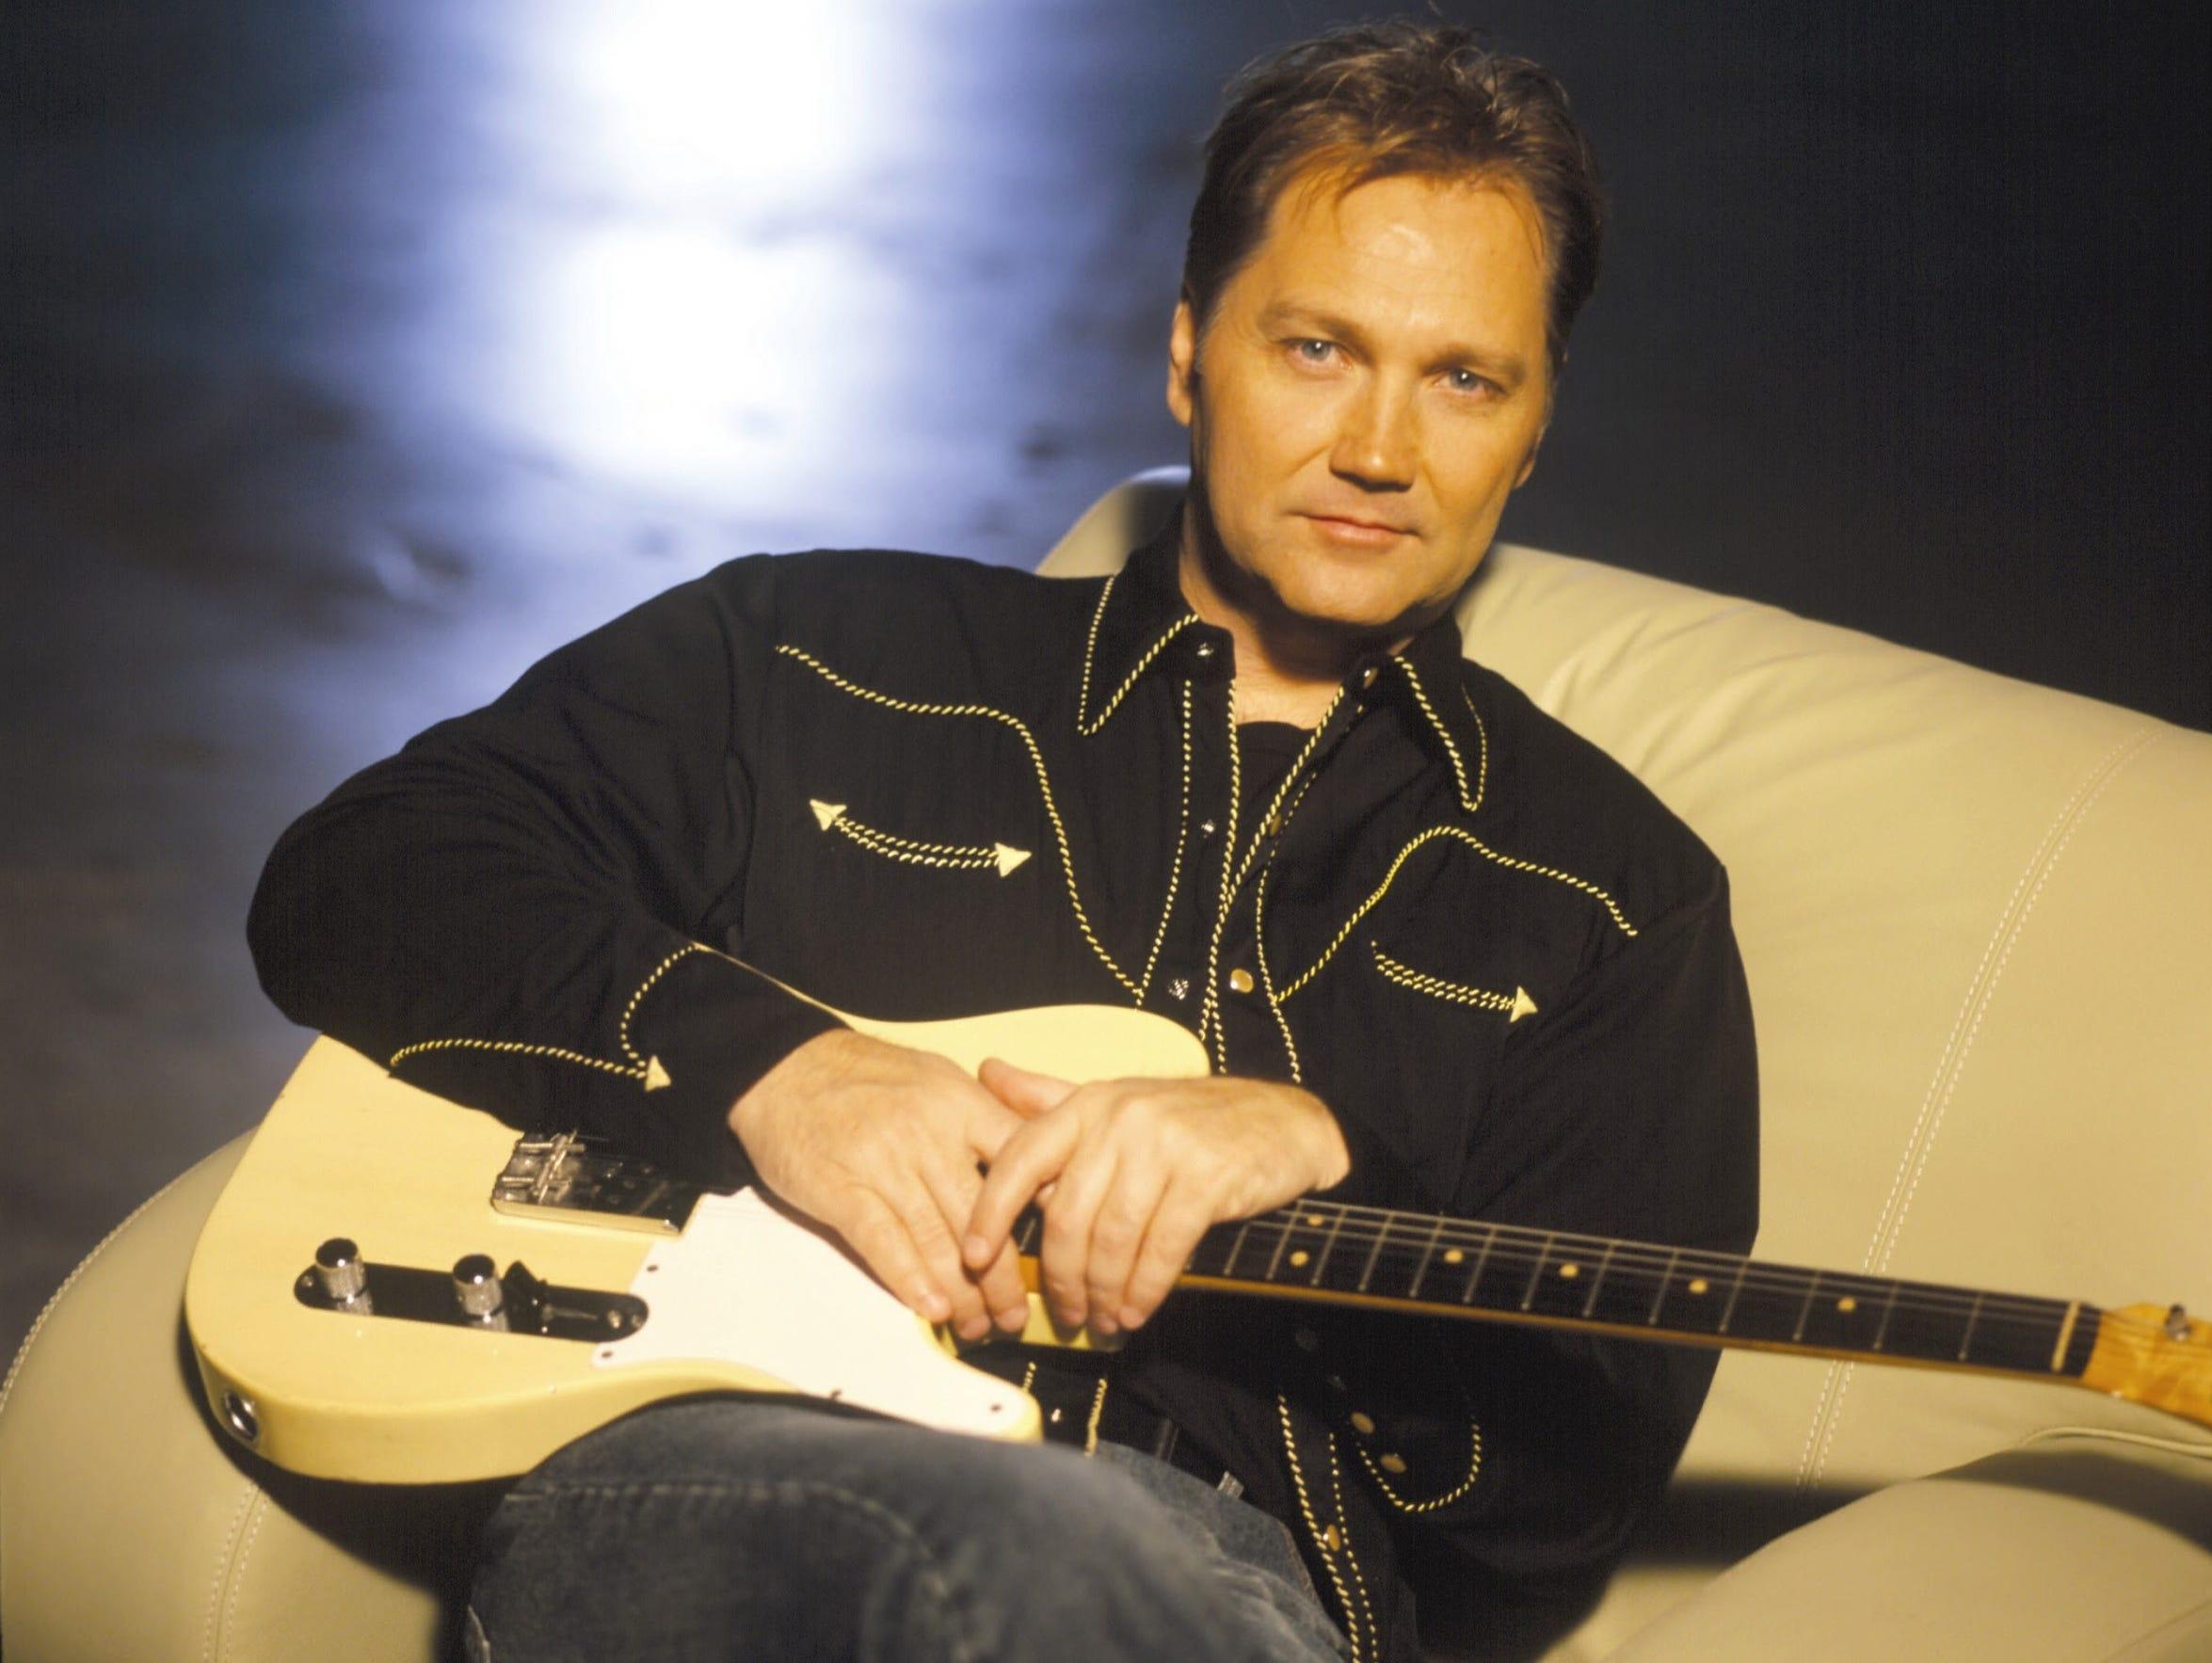 Steve Wariner won two Country Music Association awards